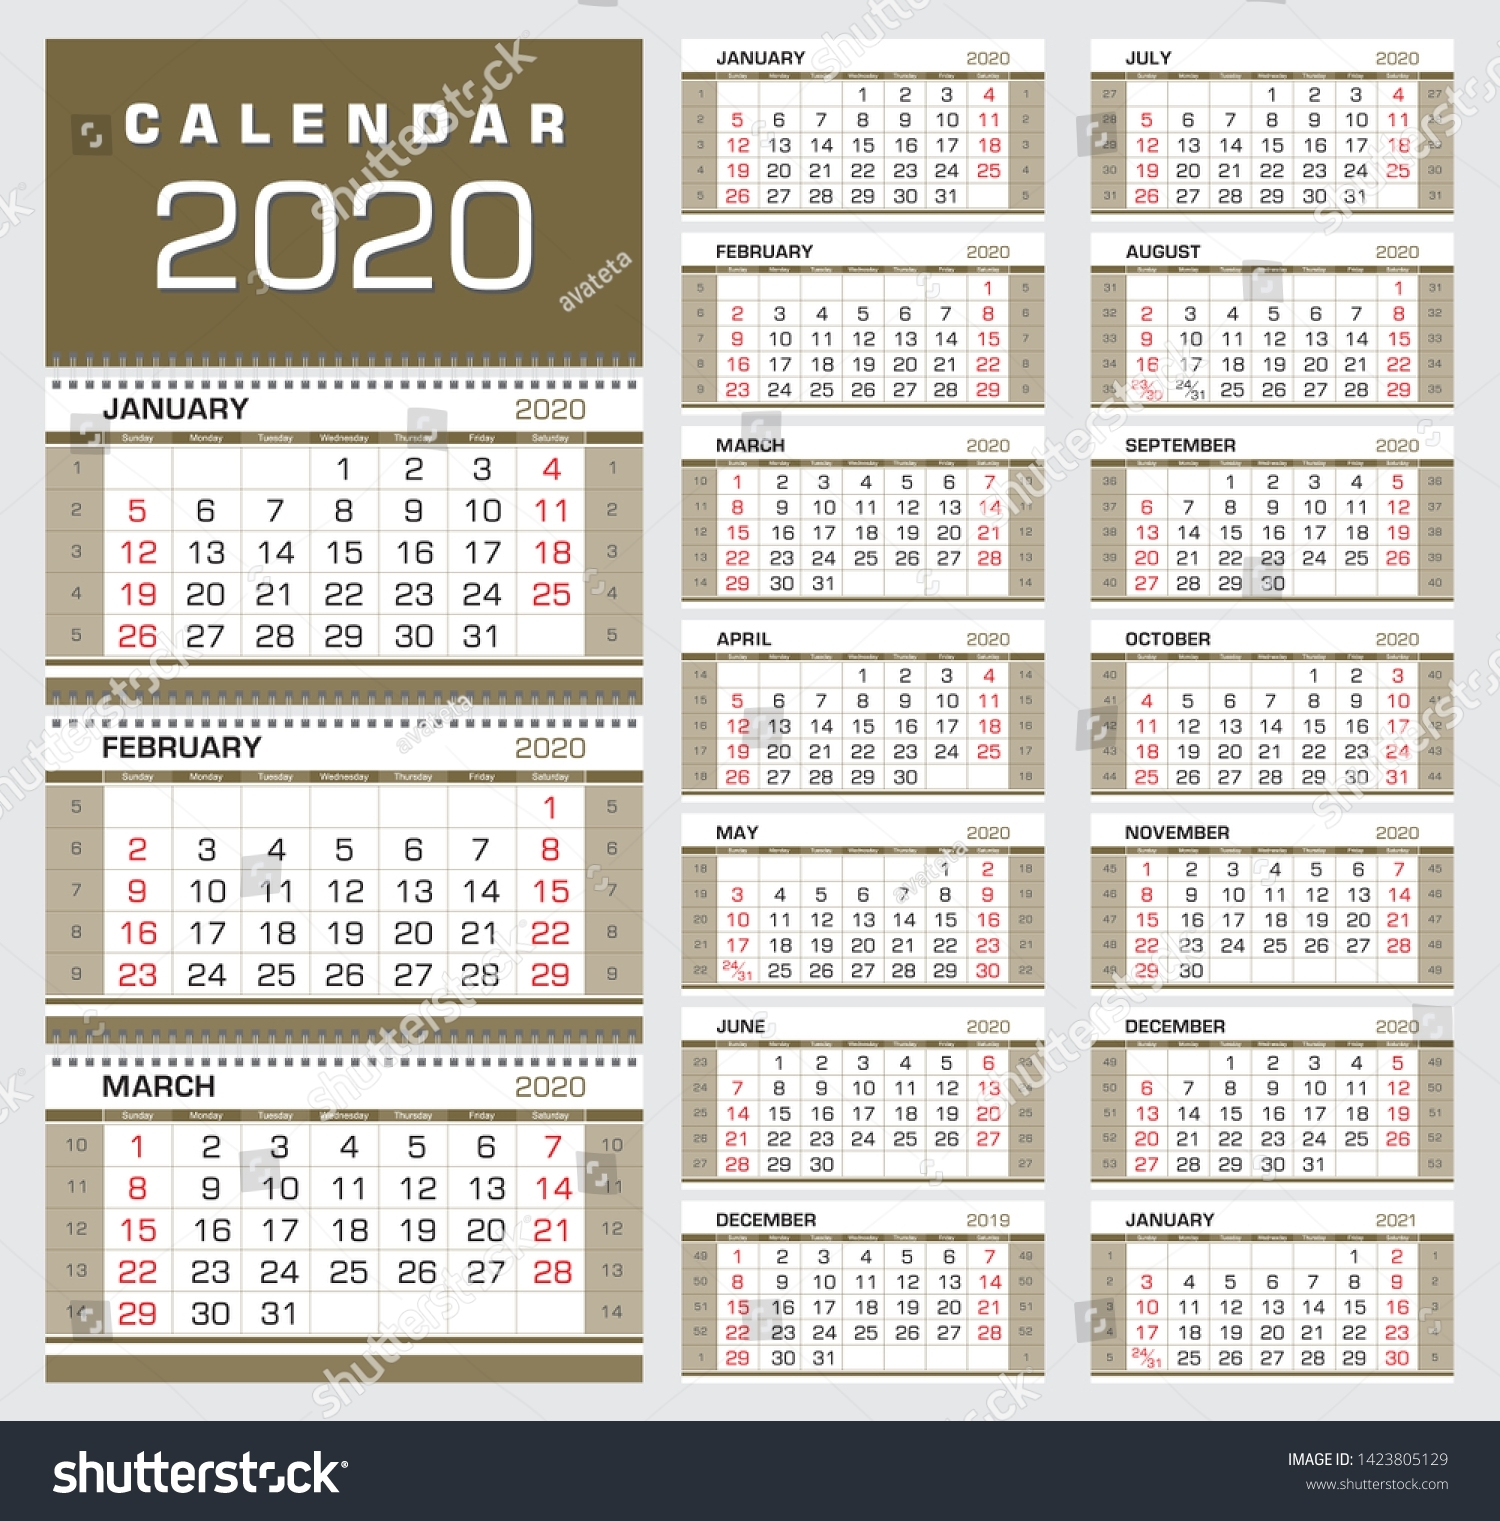 Gold Wall Quarter Calendar 2020 Week Stock Image | Download Now